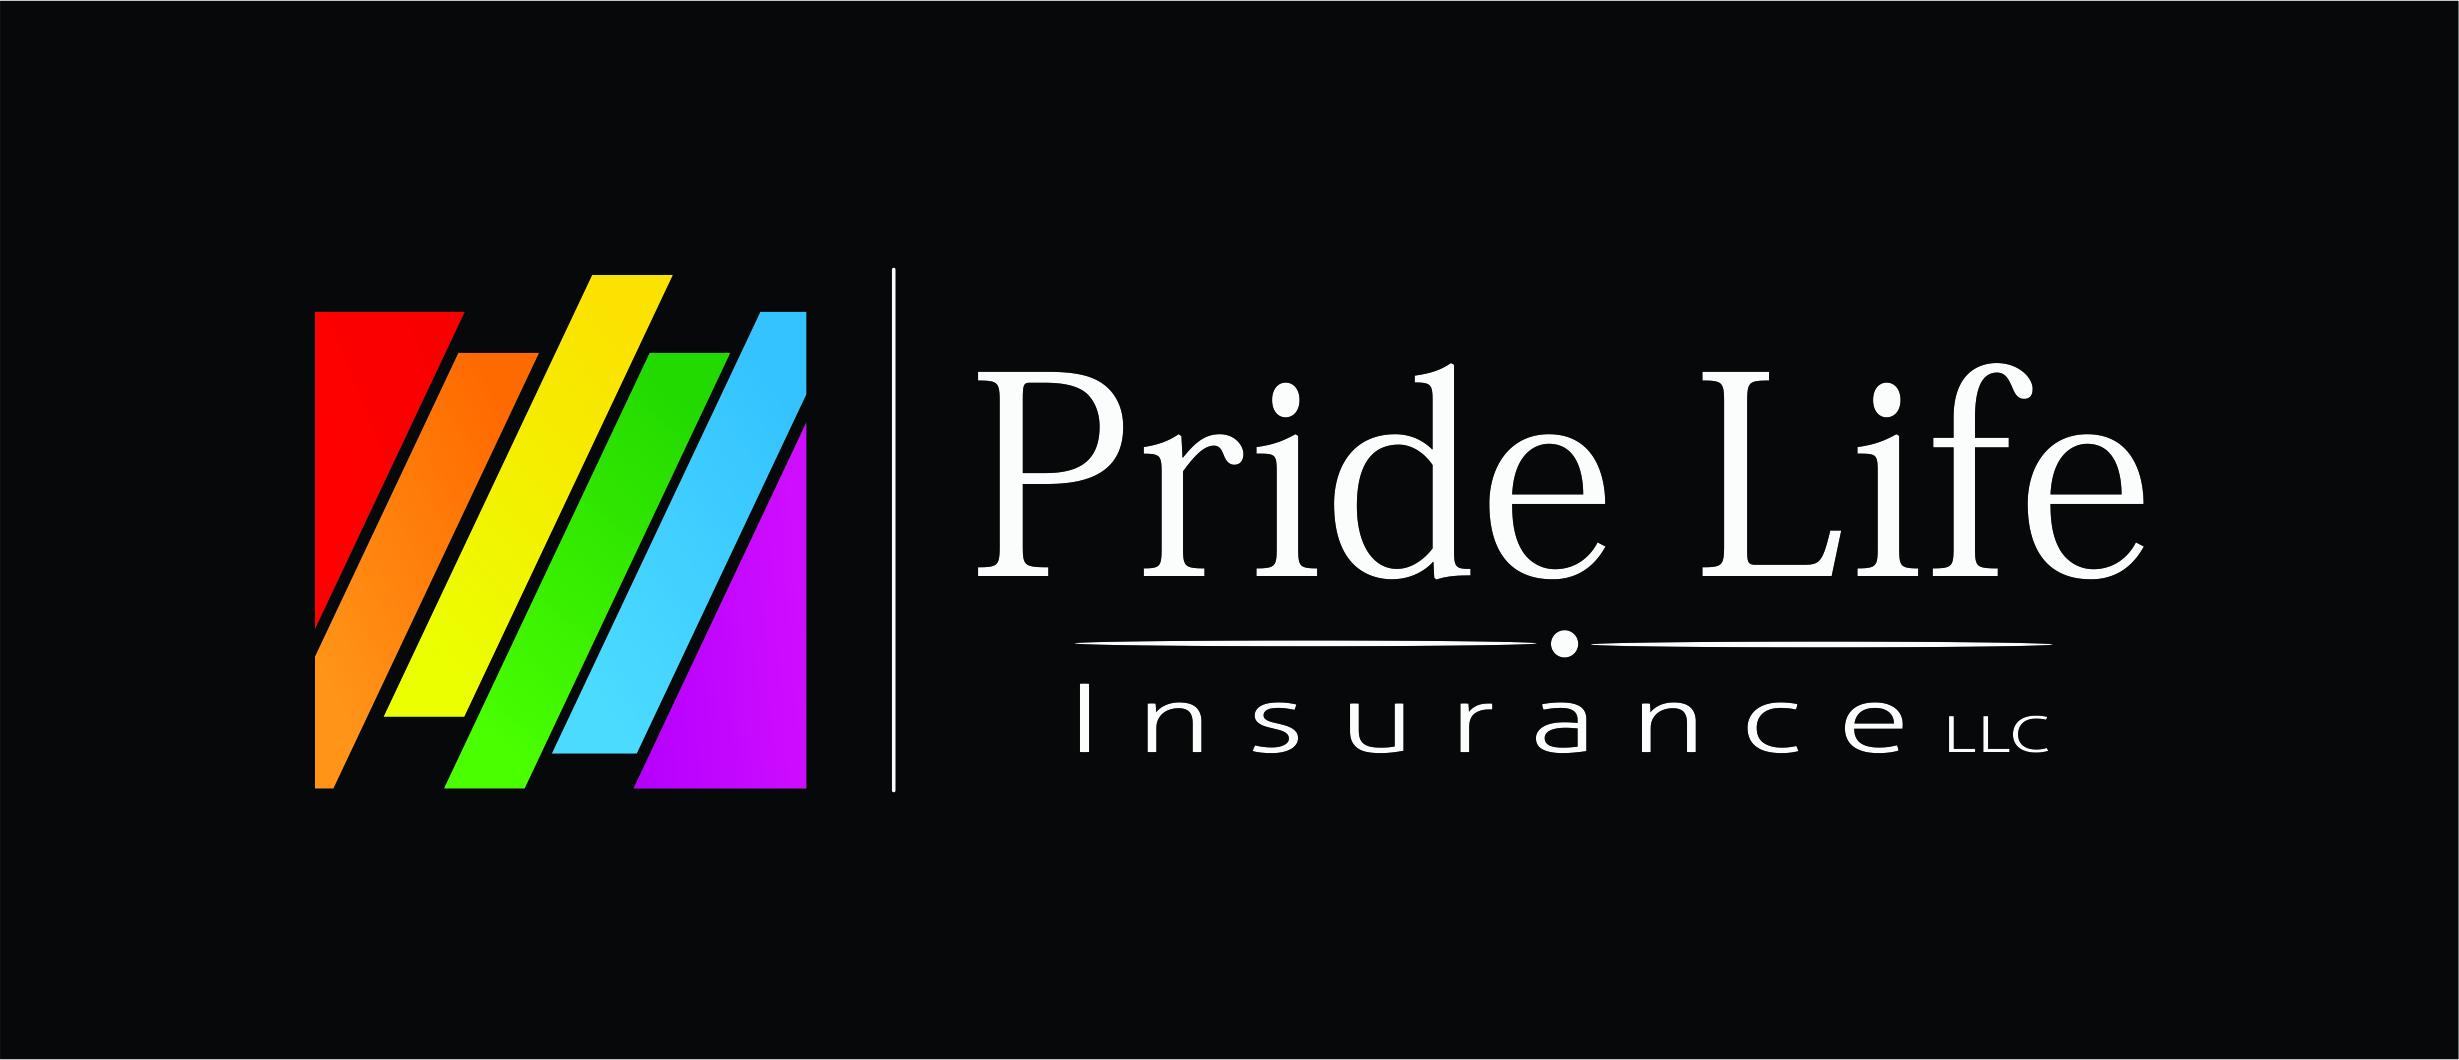 Pride Life Insurance LLC's logo